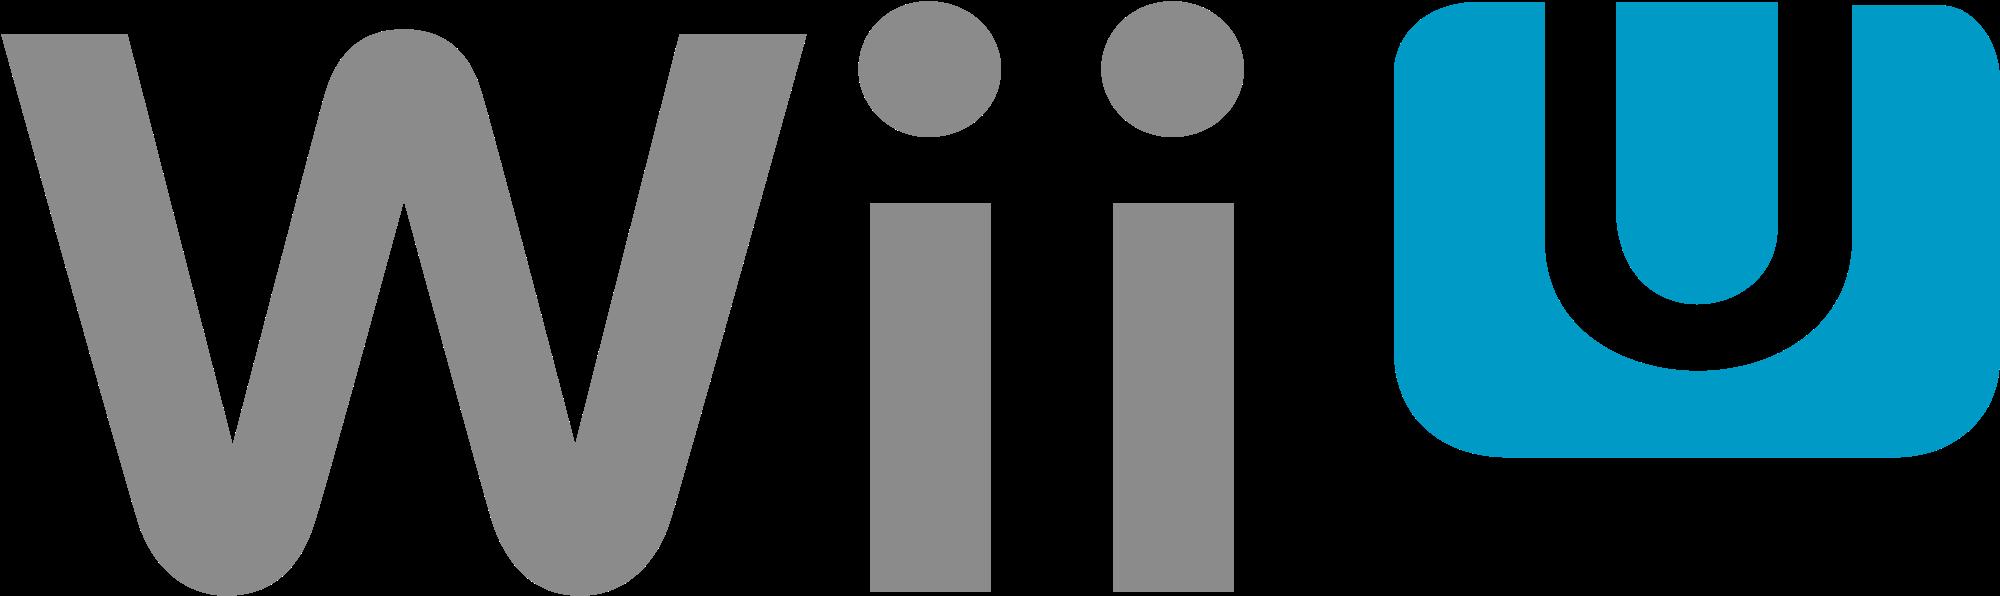 Wii U Icon #160148.